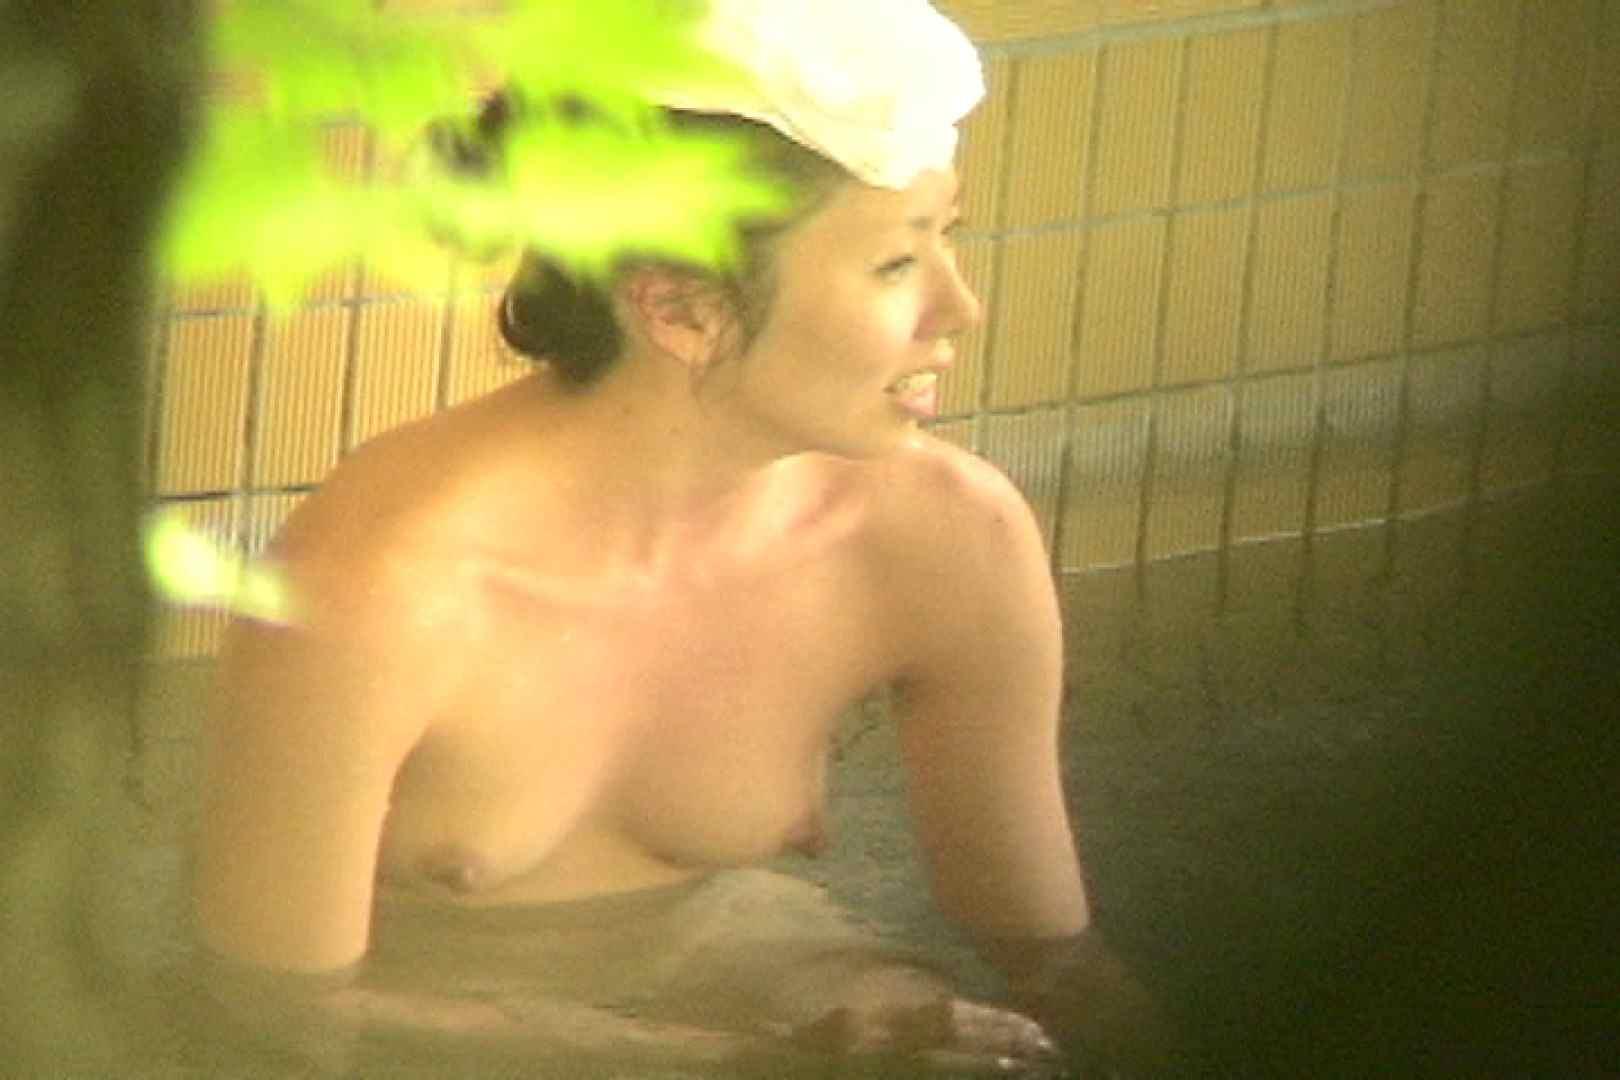 Aquaな露天風呂Vol.708 露天 オメコ無修正動画無料 50連発 7